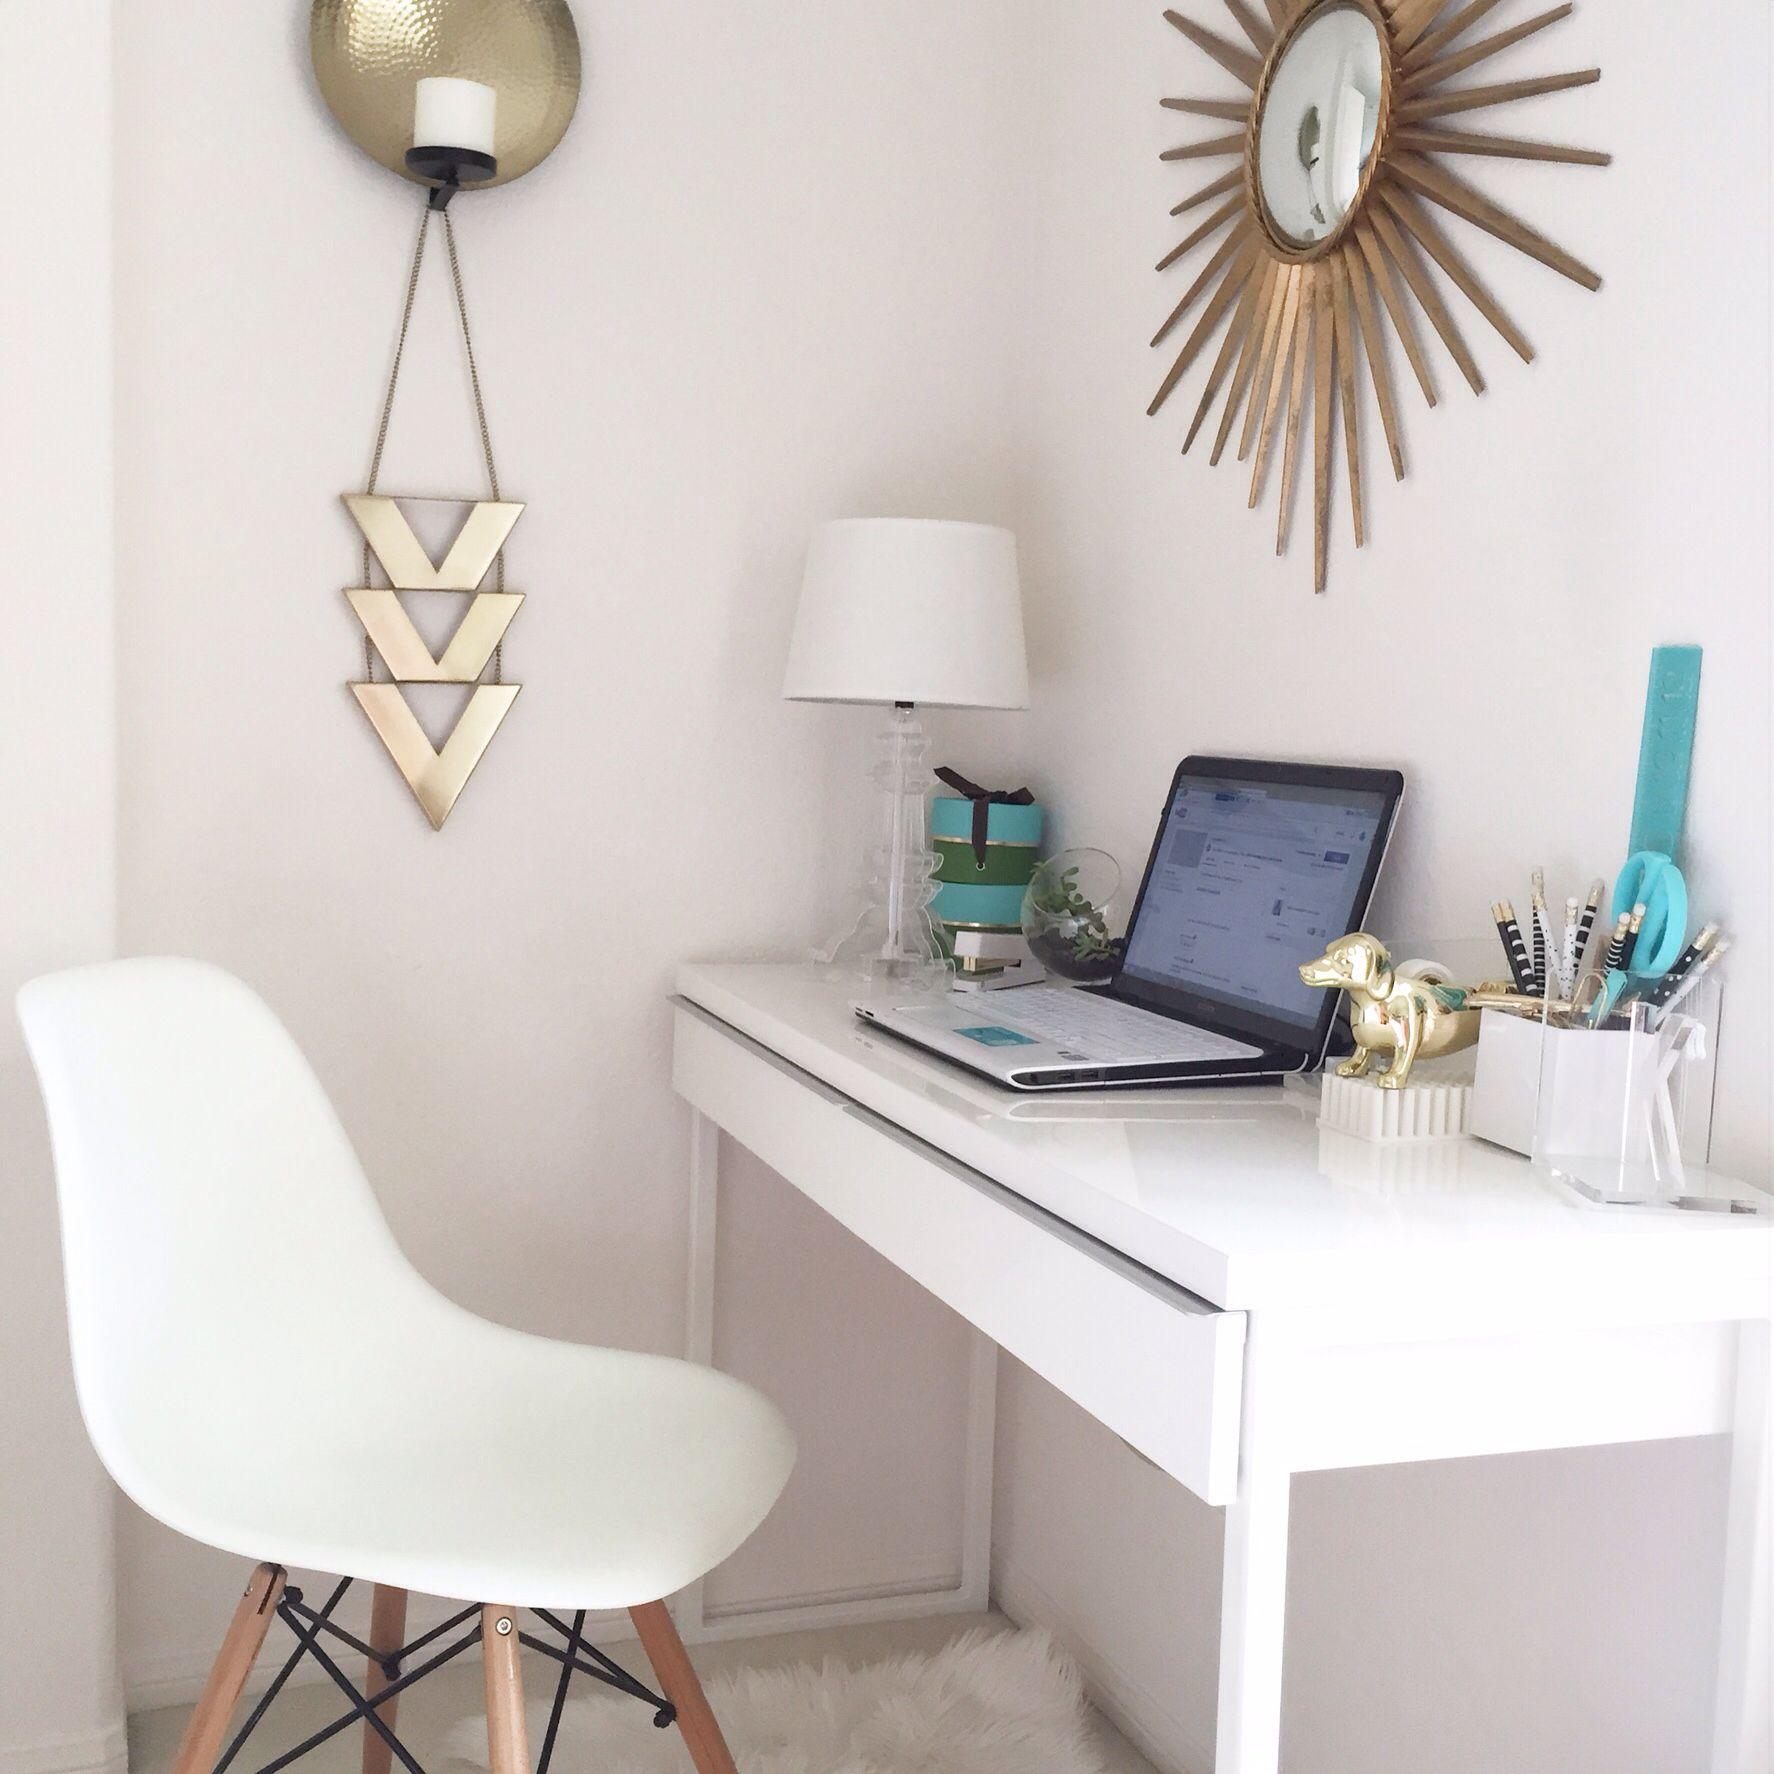 My Desk Style Ikea Besta Burs Eames Style Chair Apartment  # Meuble Tv Ikea Besta Burs Noir